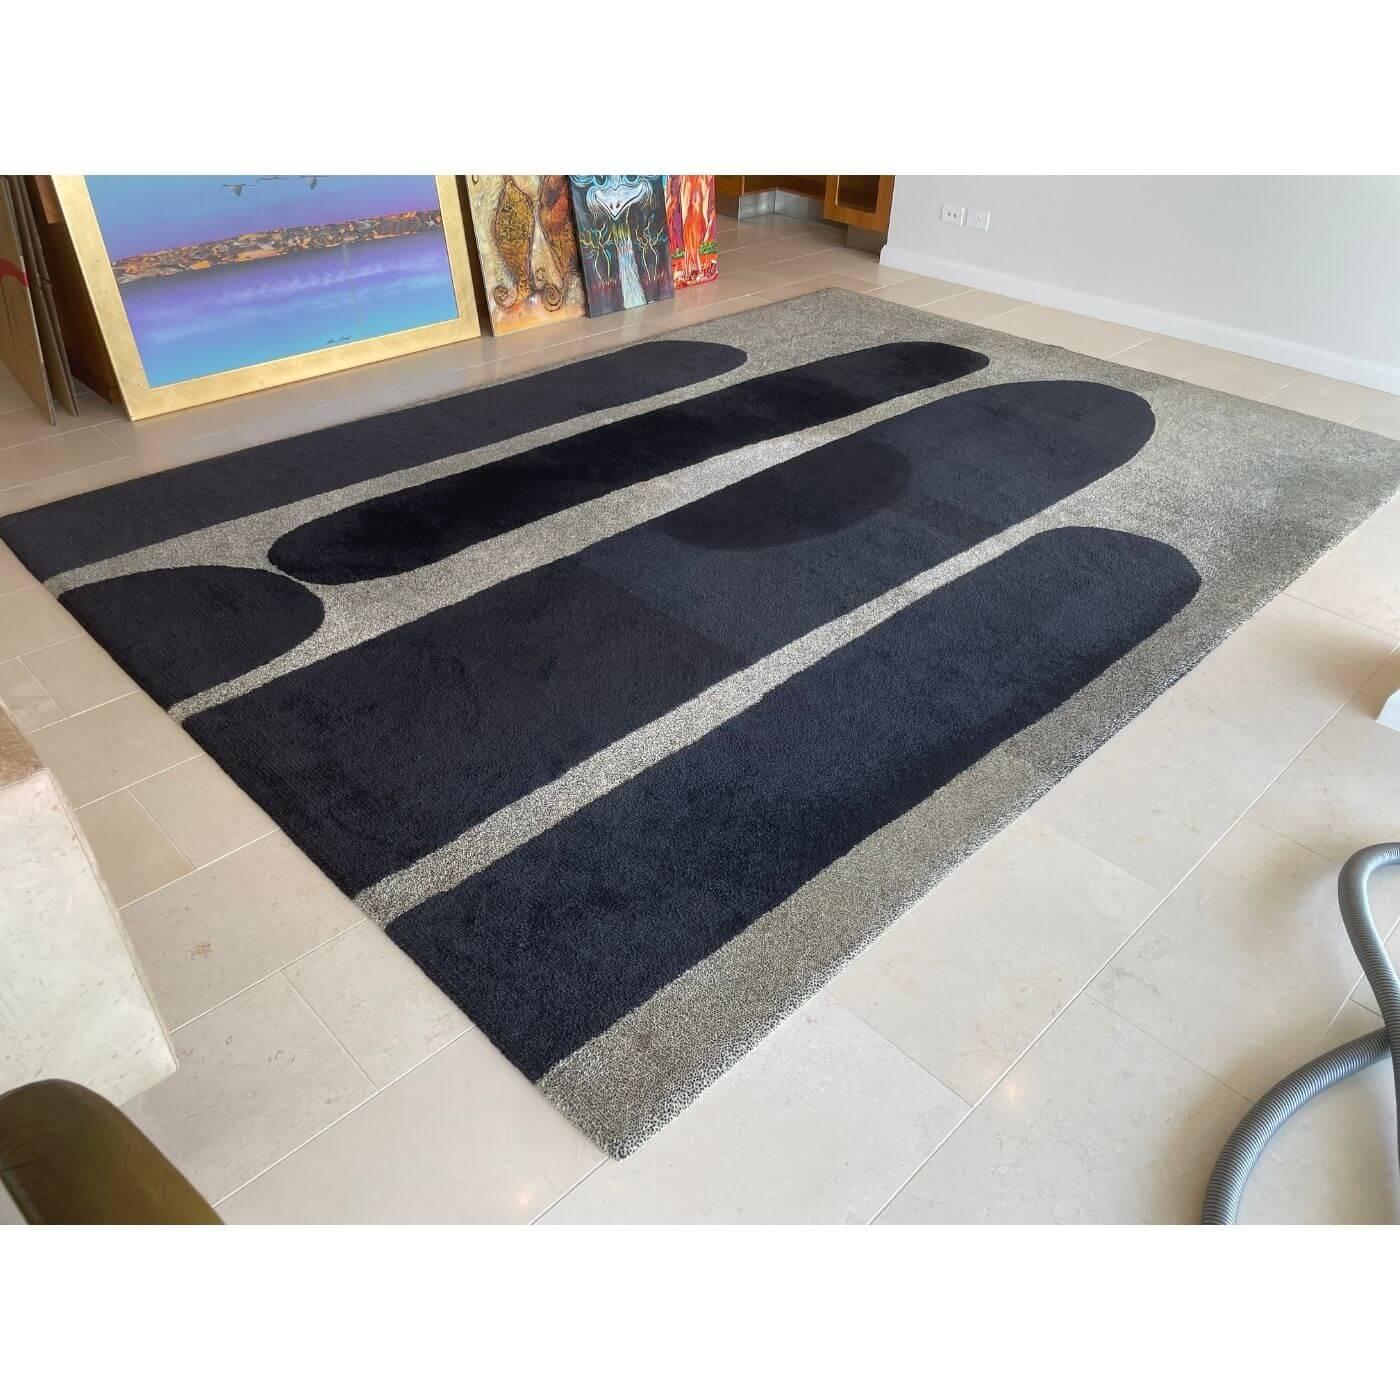 Designer Rugs Dinosaur Designs rug on Two Design Lovers marketplace, second hand